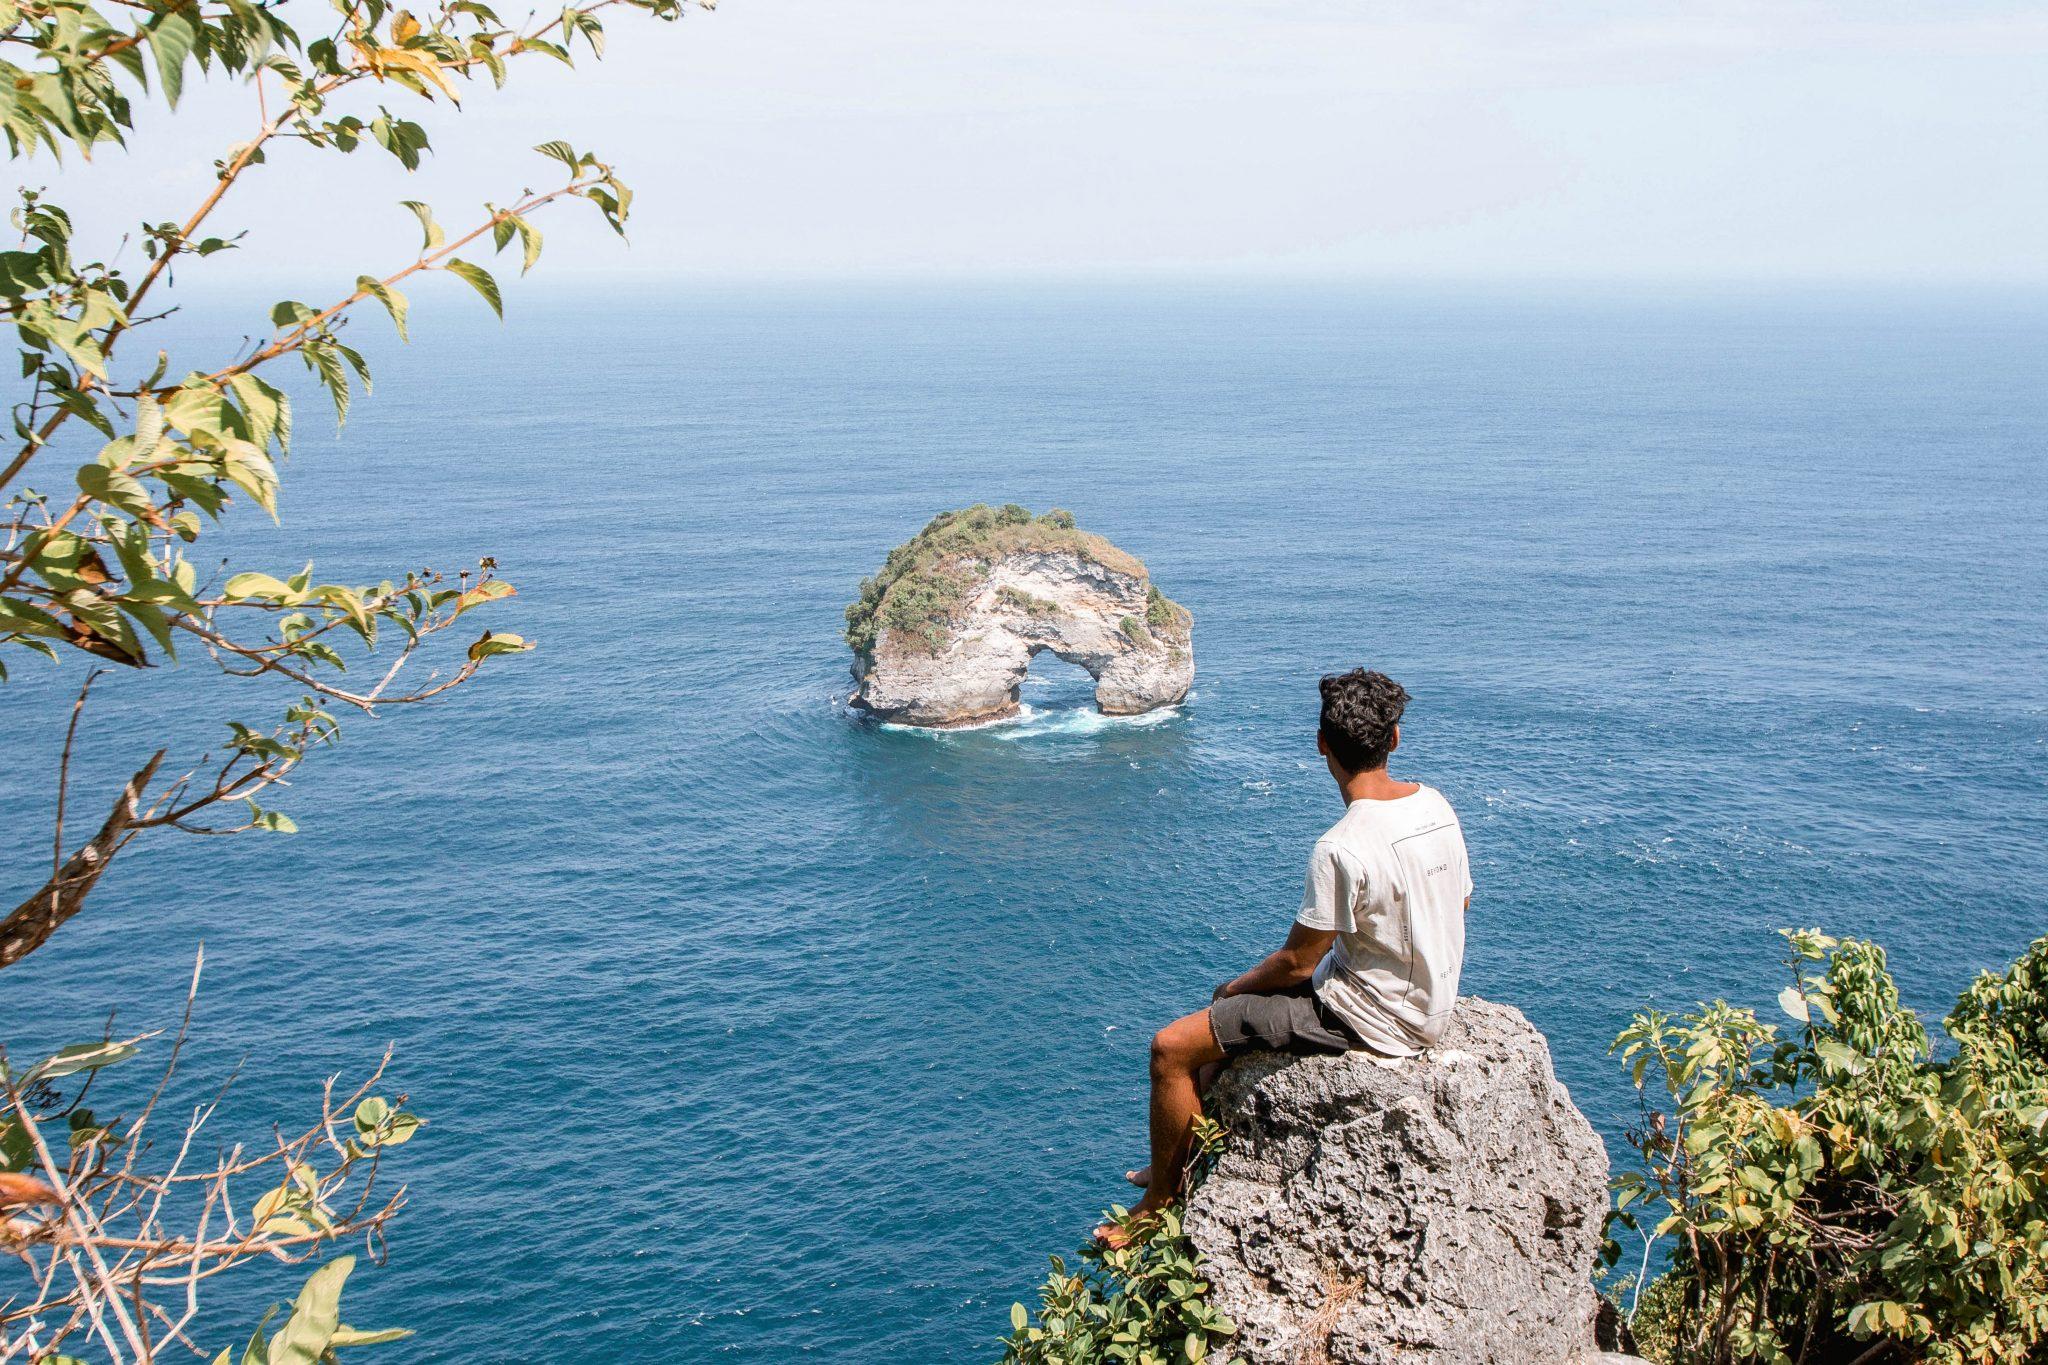 Wanderers & Warriors - Banah Cliff Point Nusa Penida Bali - viewpoint nusa penida viewpoint - cliff nusa penida cliff